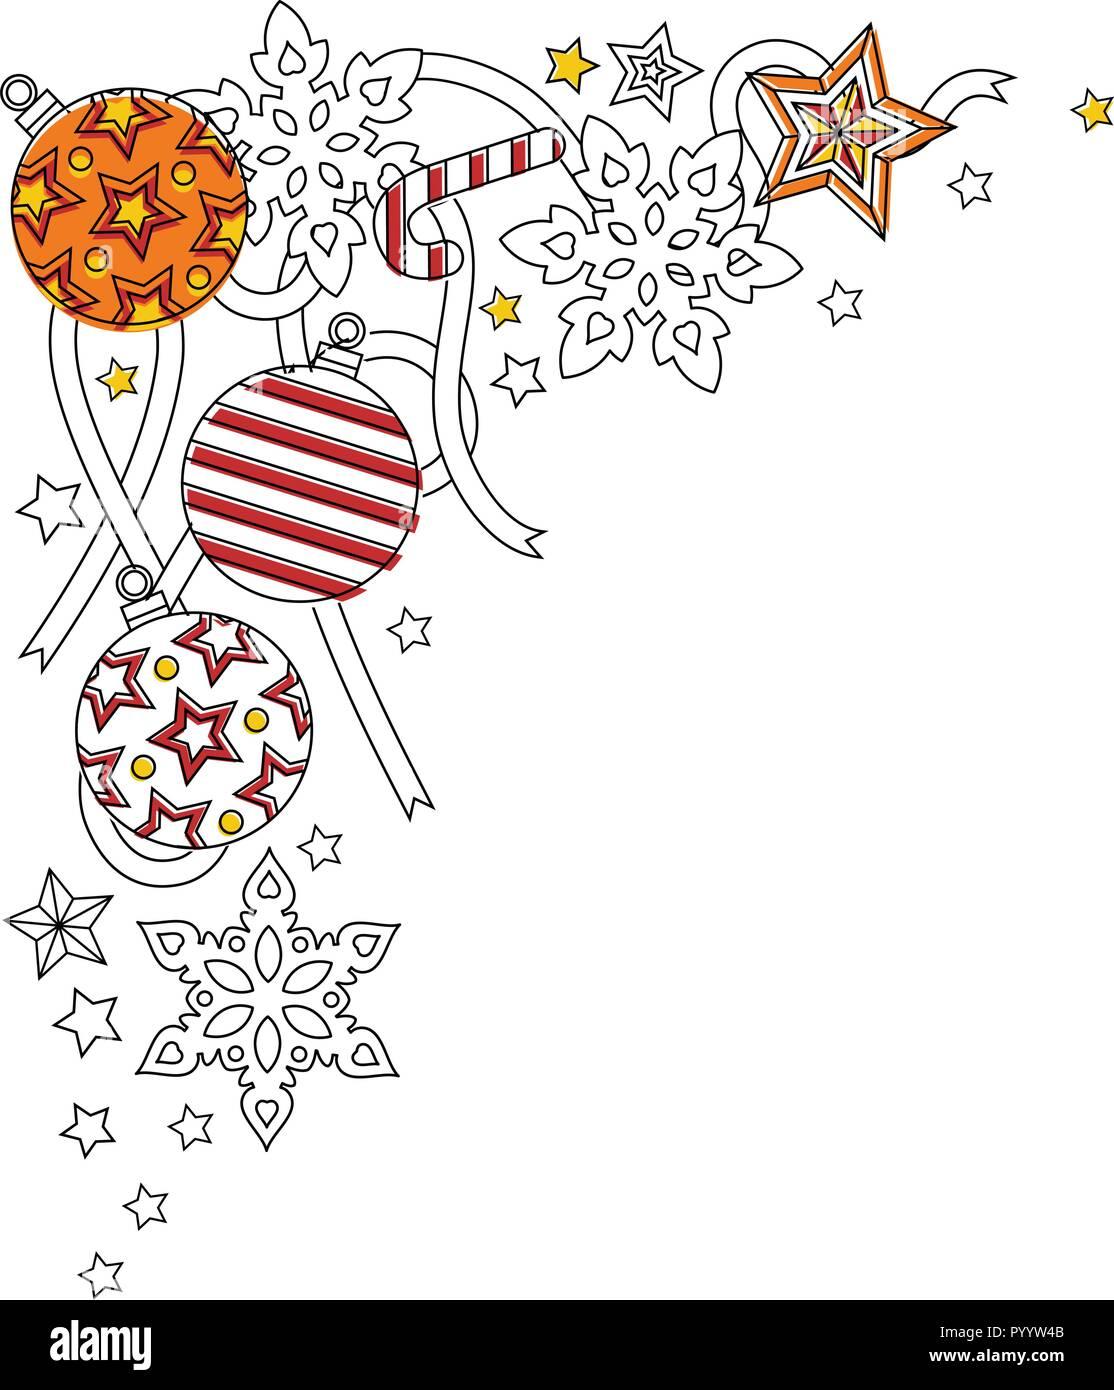 new year frame border with doodle snowflakes fir tree balls ribbon decorative border